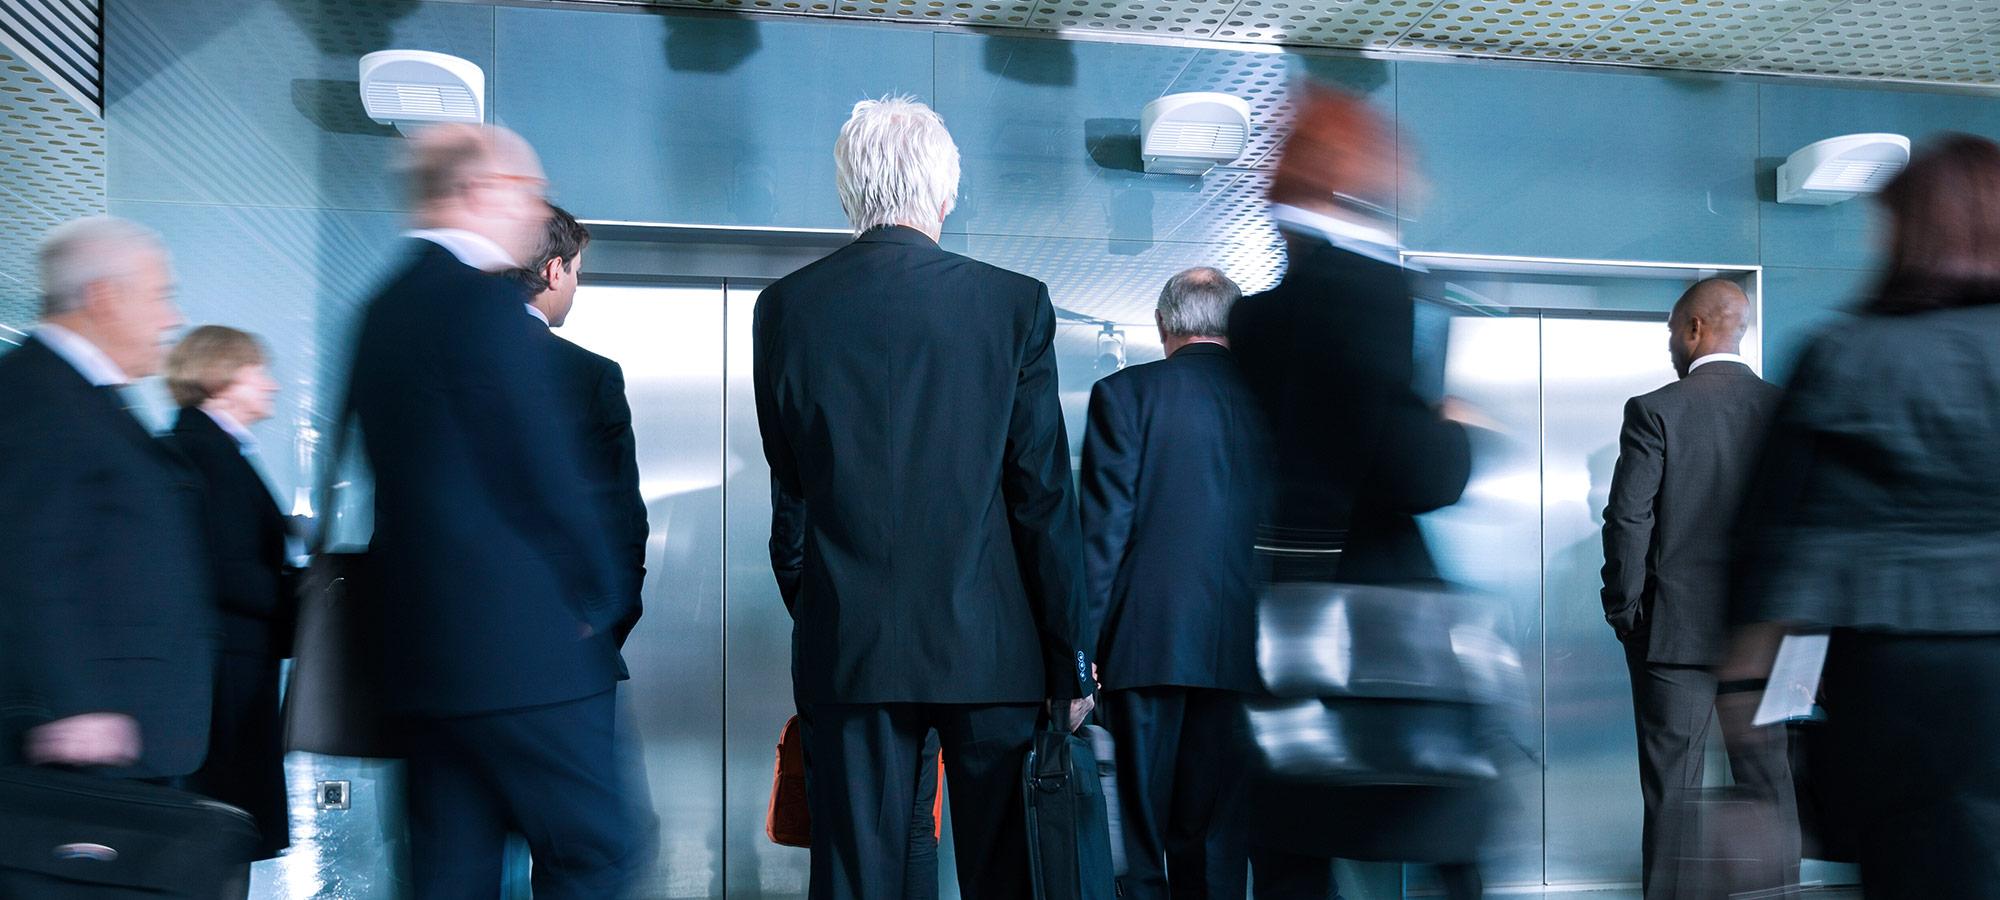 نصب آسانسور